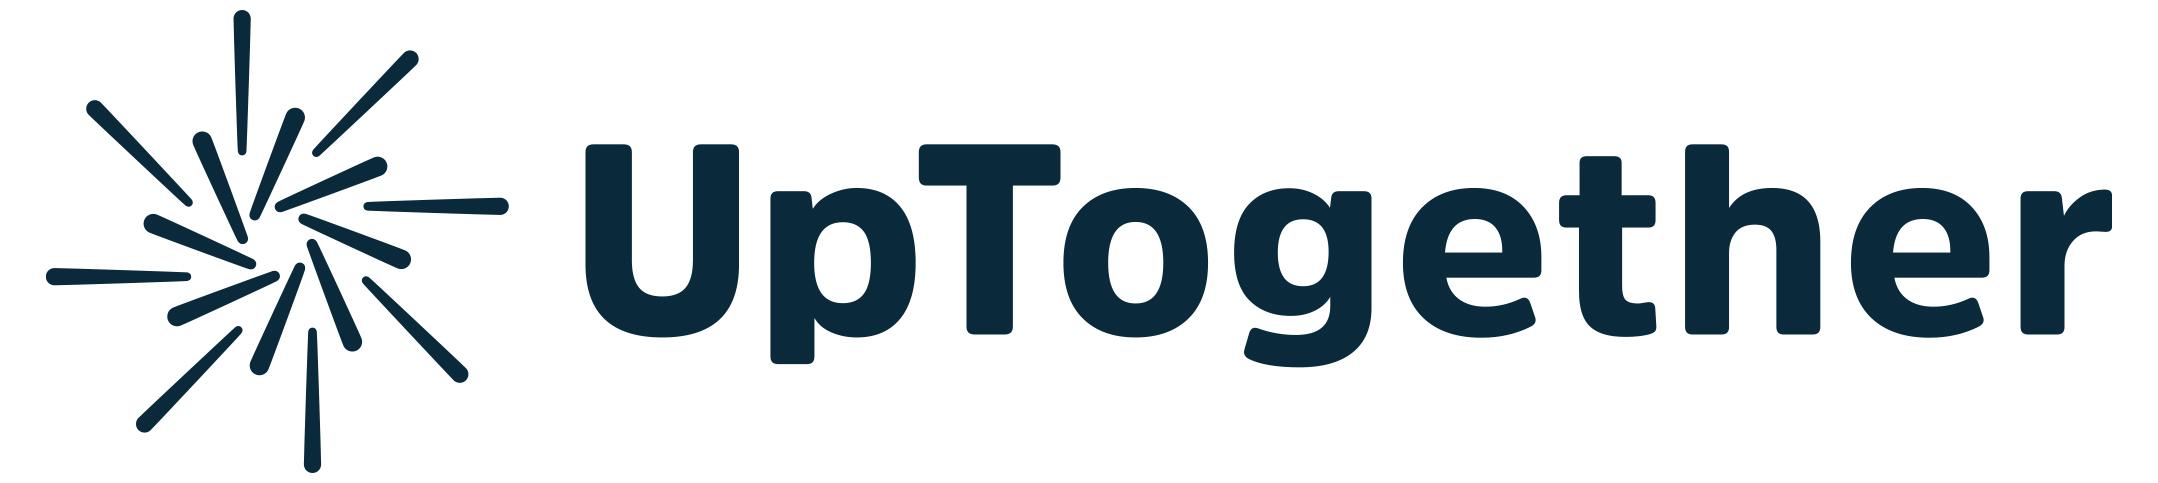 UPTOGETHER-LOGO-horizontal